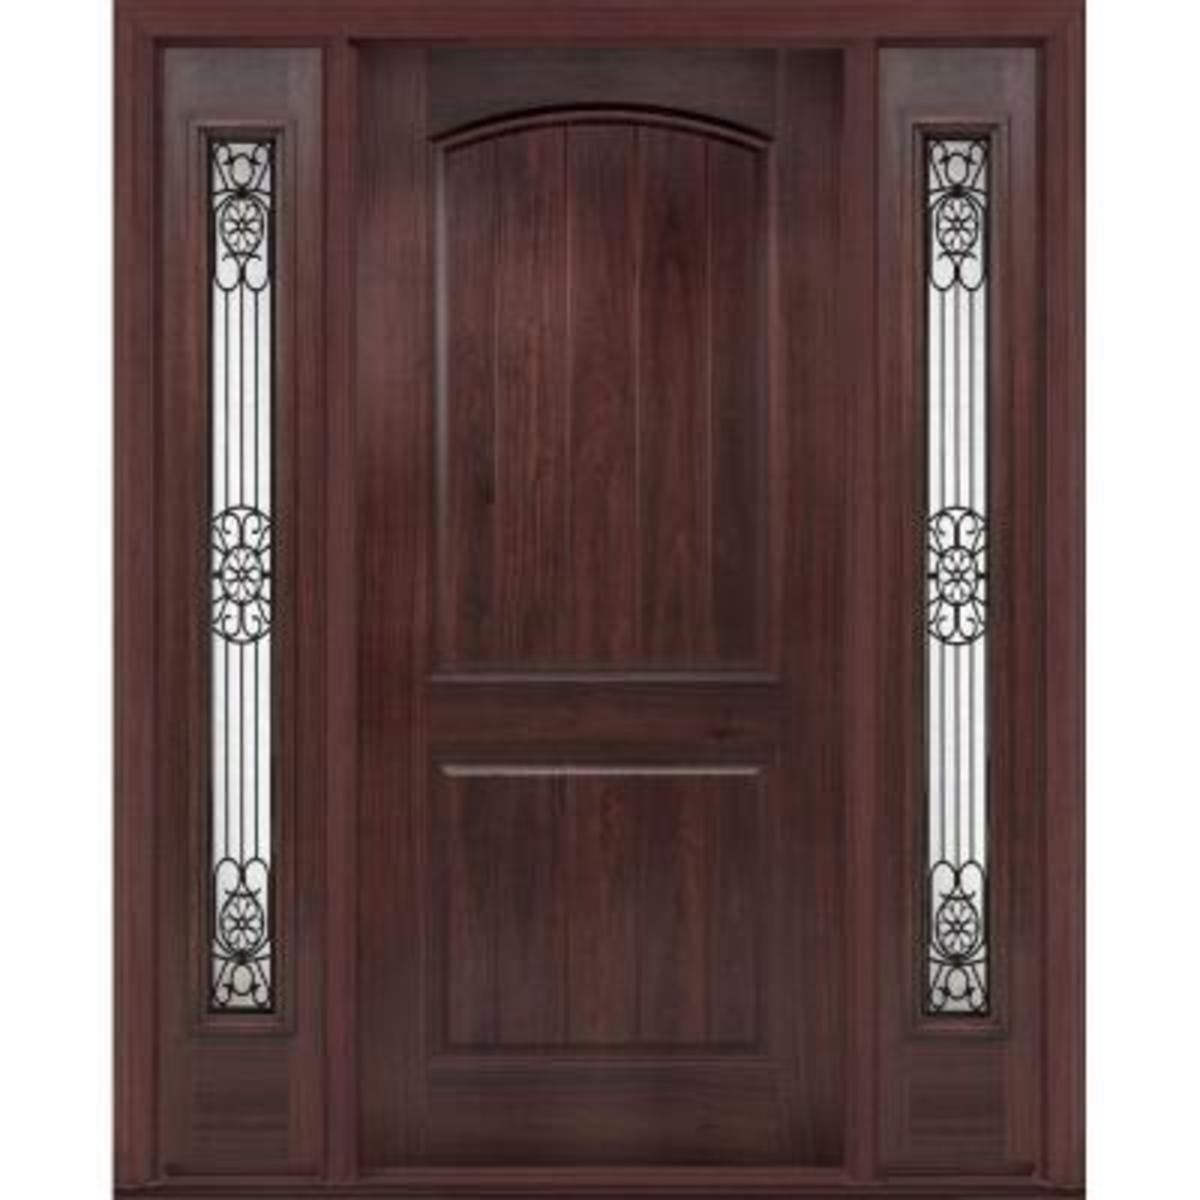 Fiberglass Black Walnut Door homedepot.com